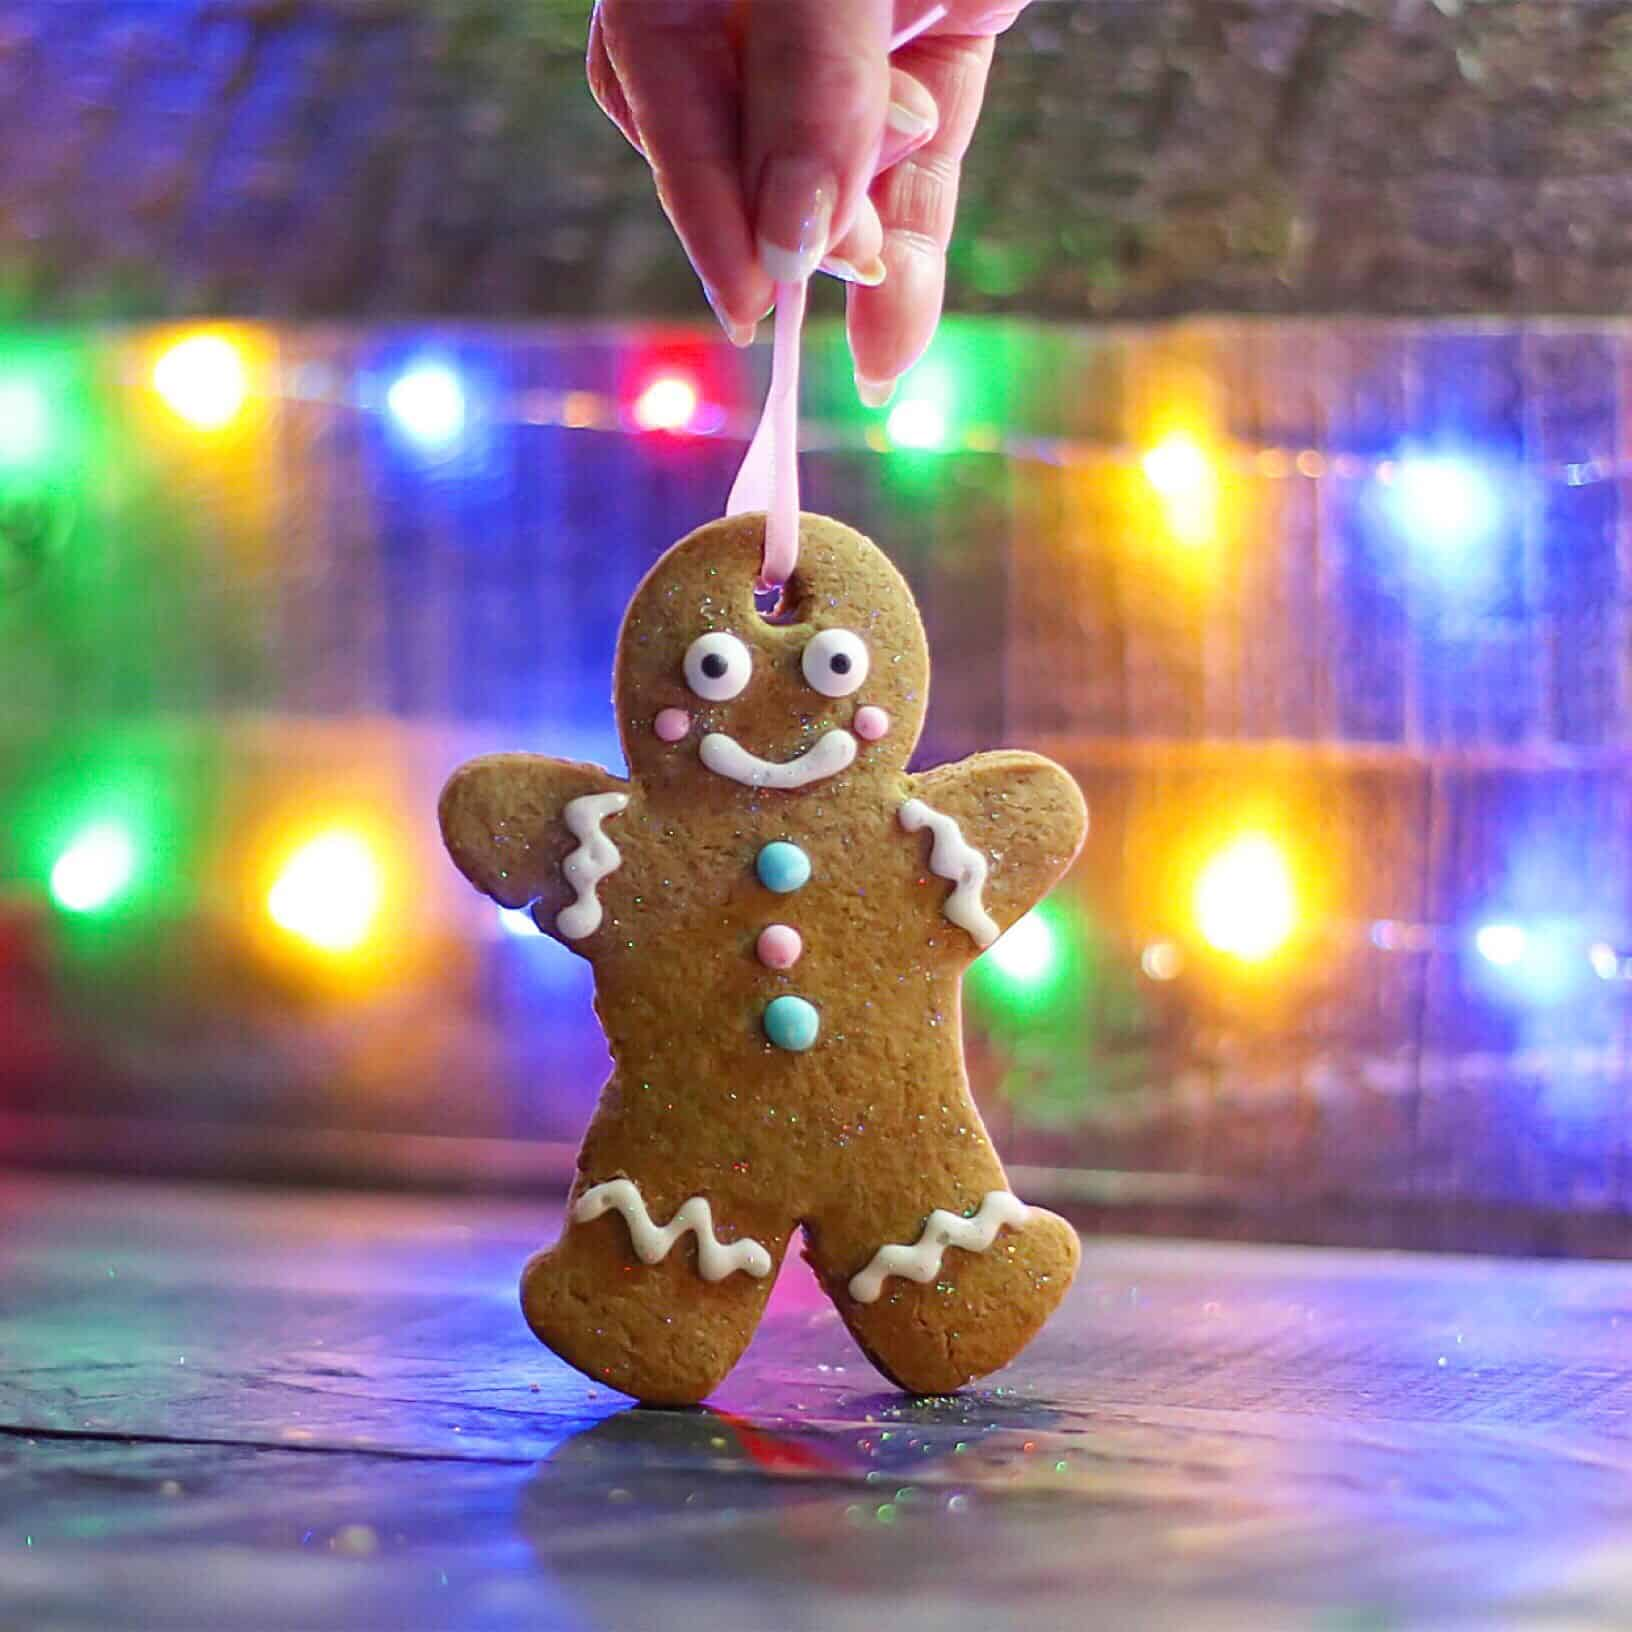 GF Gingerbread Man